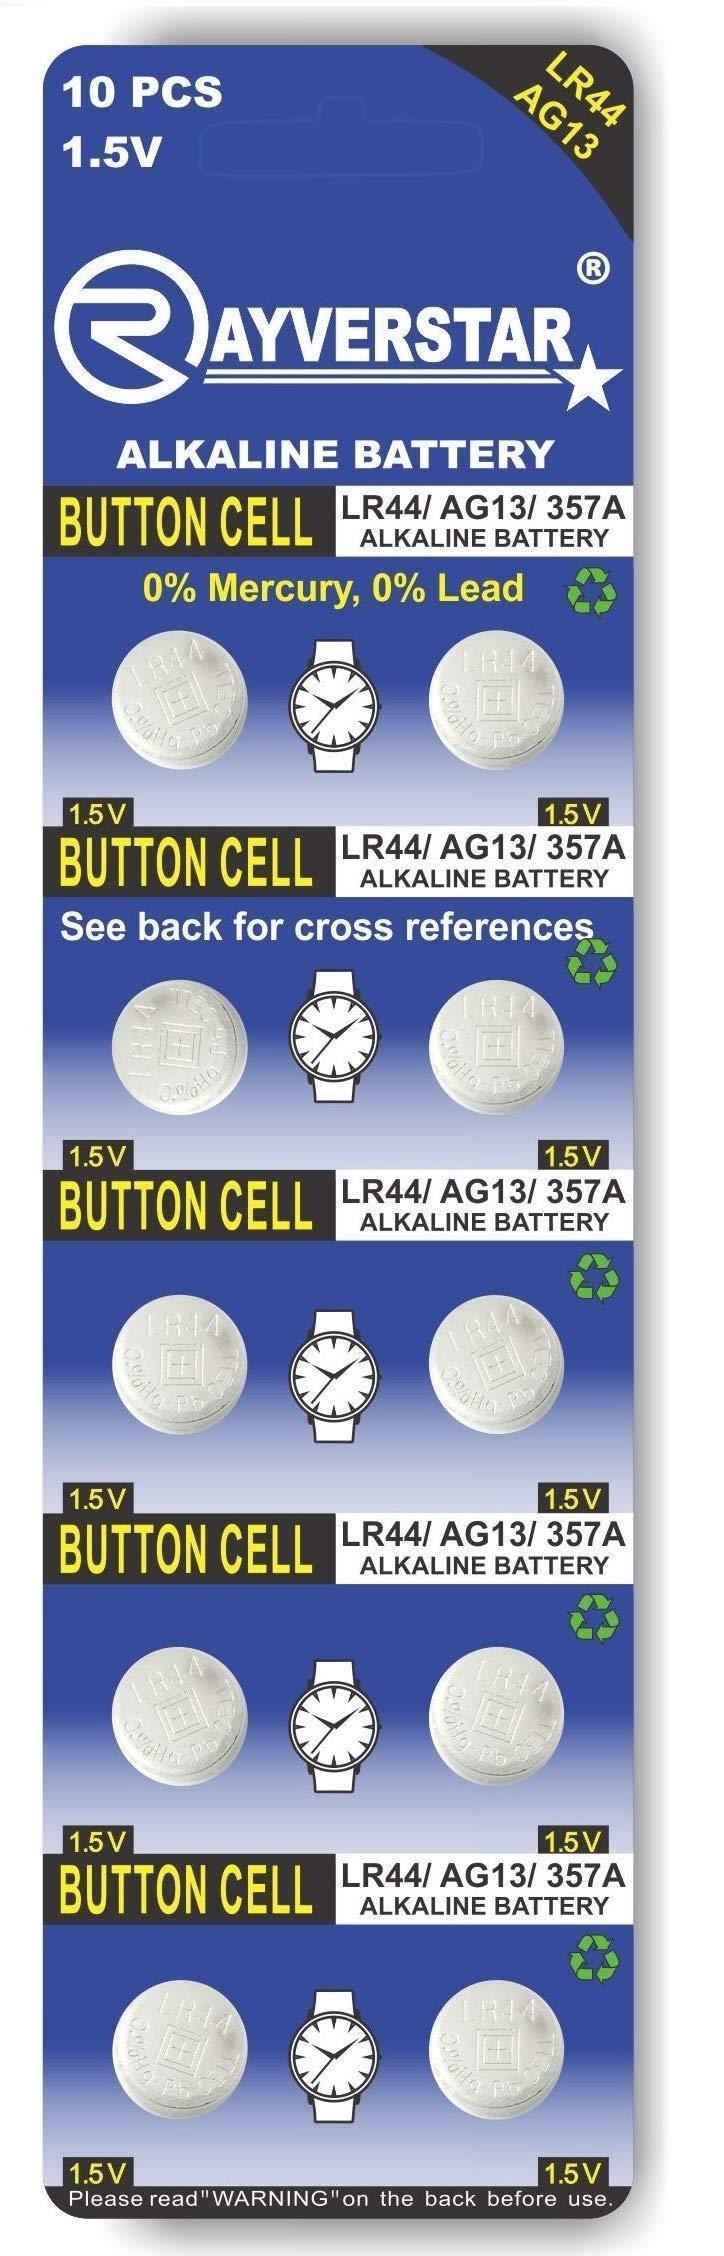 Rayverstar LR44 AG13 1.5 Volt Alkaline (10-Batteries) Fits: A76, GPA76, L1154F, L1154, 357A, 157, 303, 357, SR44, SR44SW, EPX76, PX76, PX76A, Hexbug, (Full List Below)